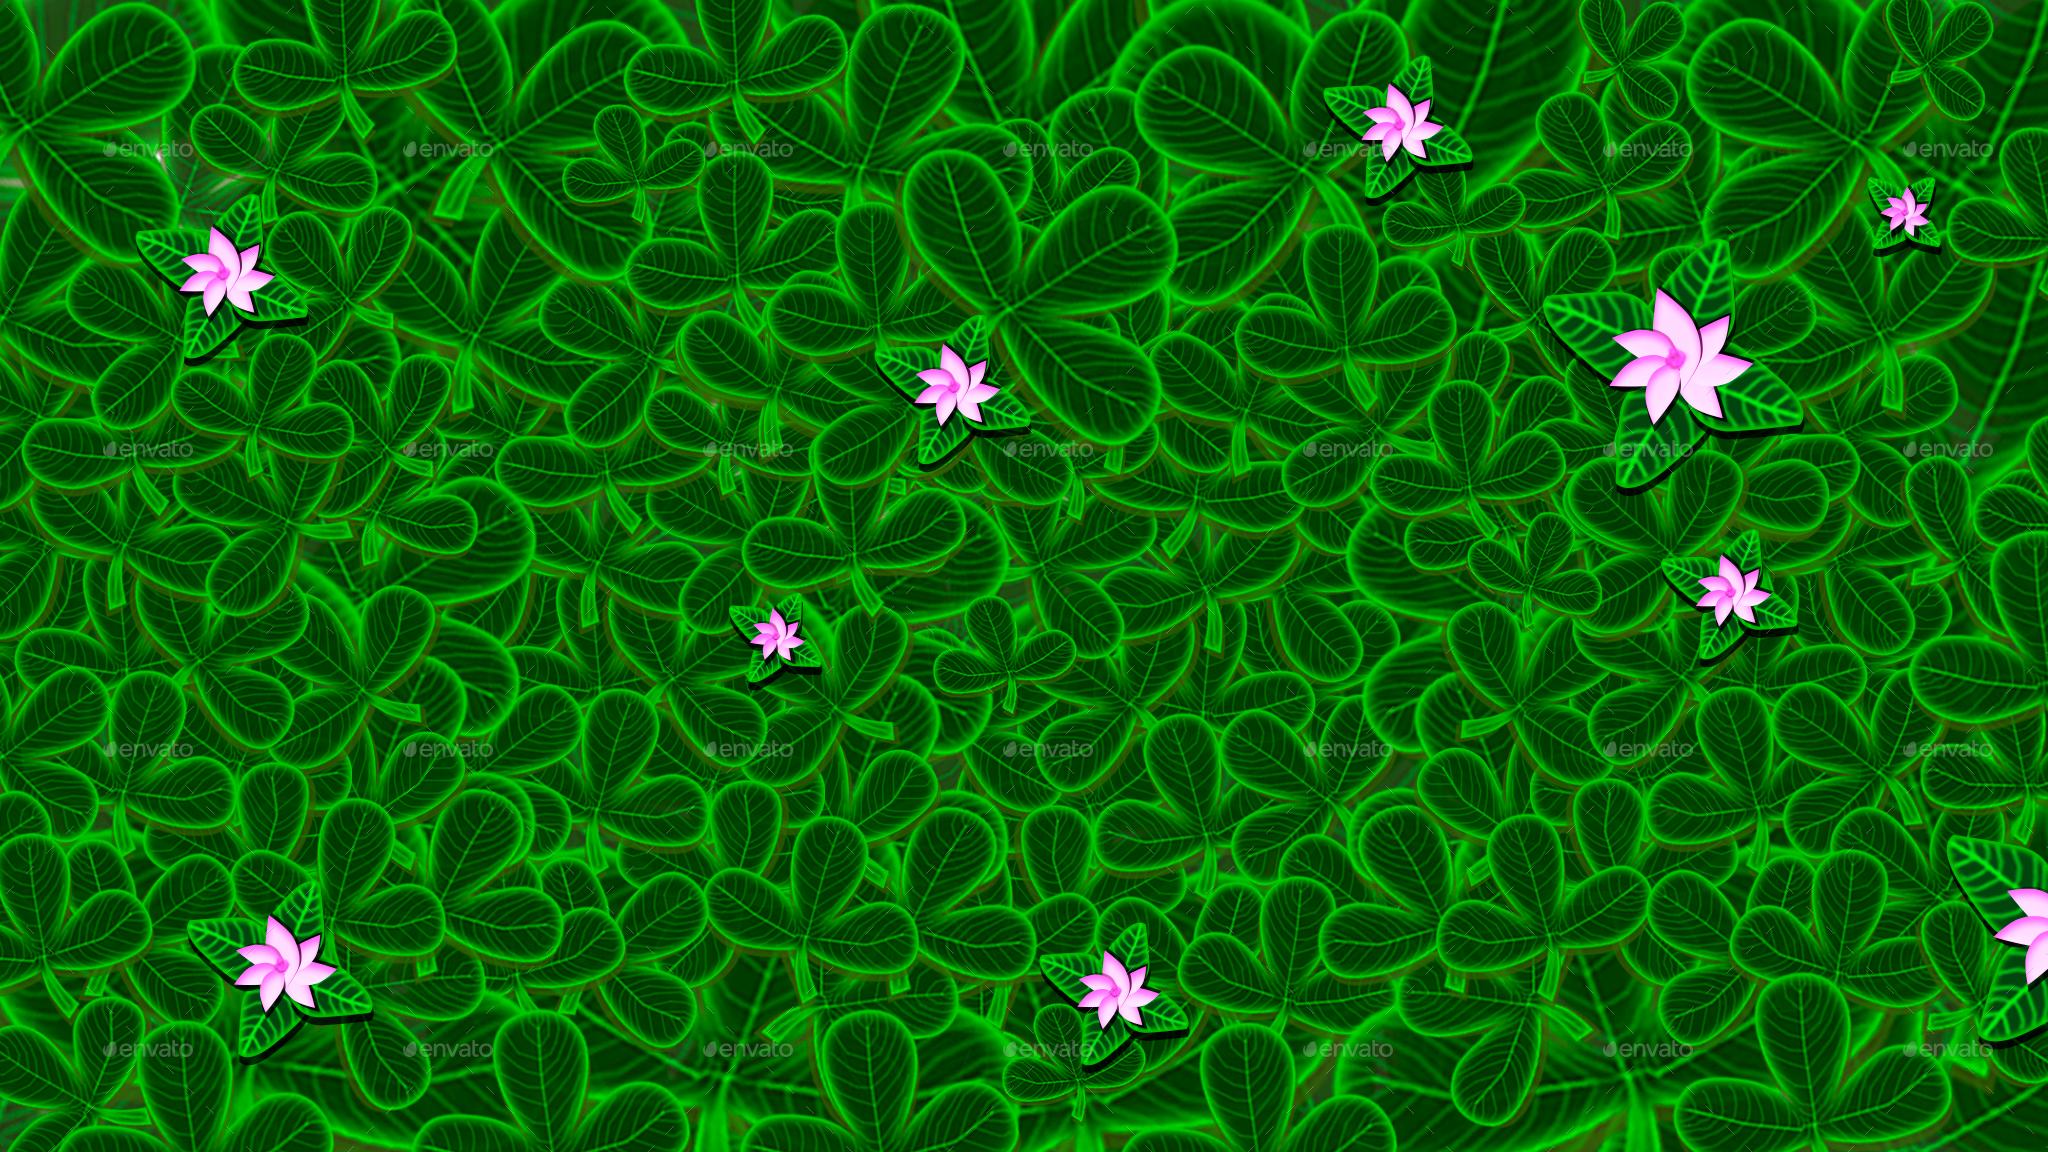 StPatricks Day Backgrounds by Creative Mobile Studio 2048x1152